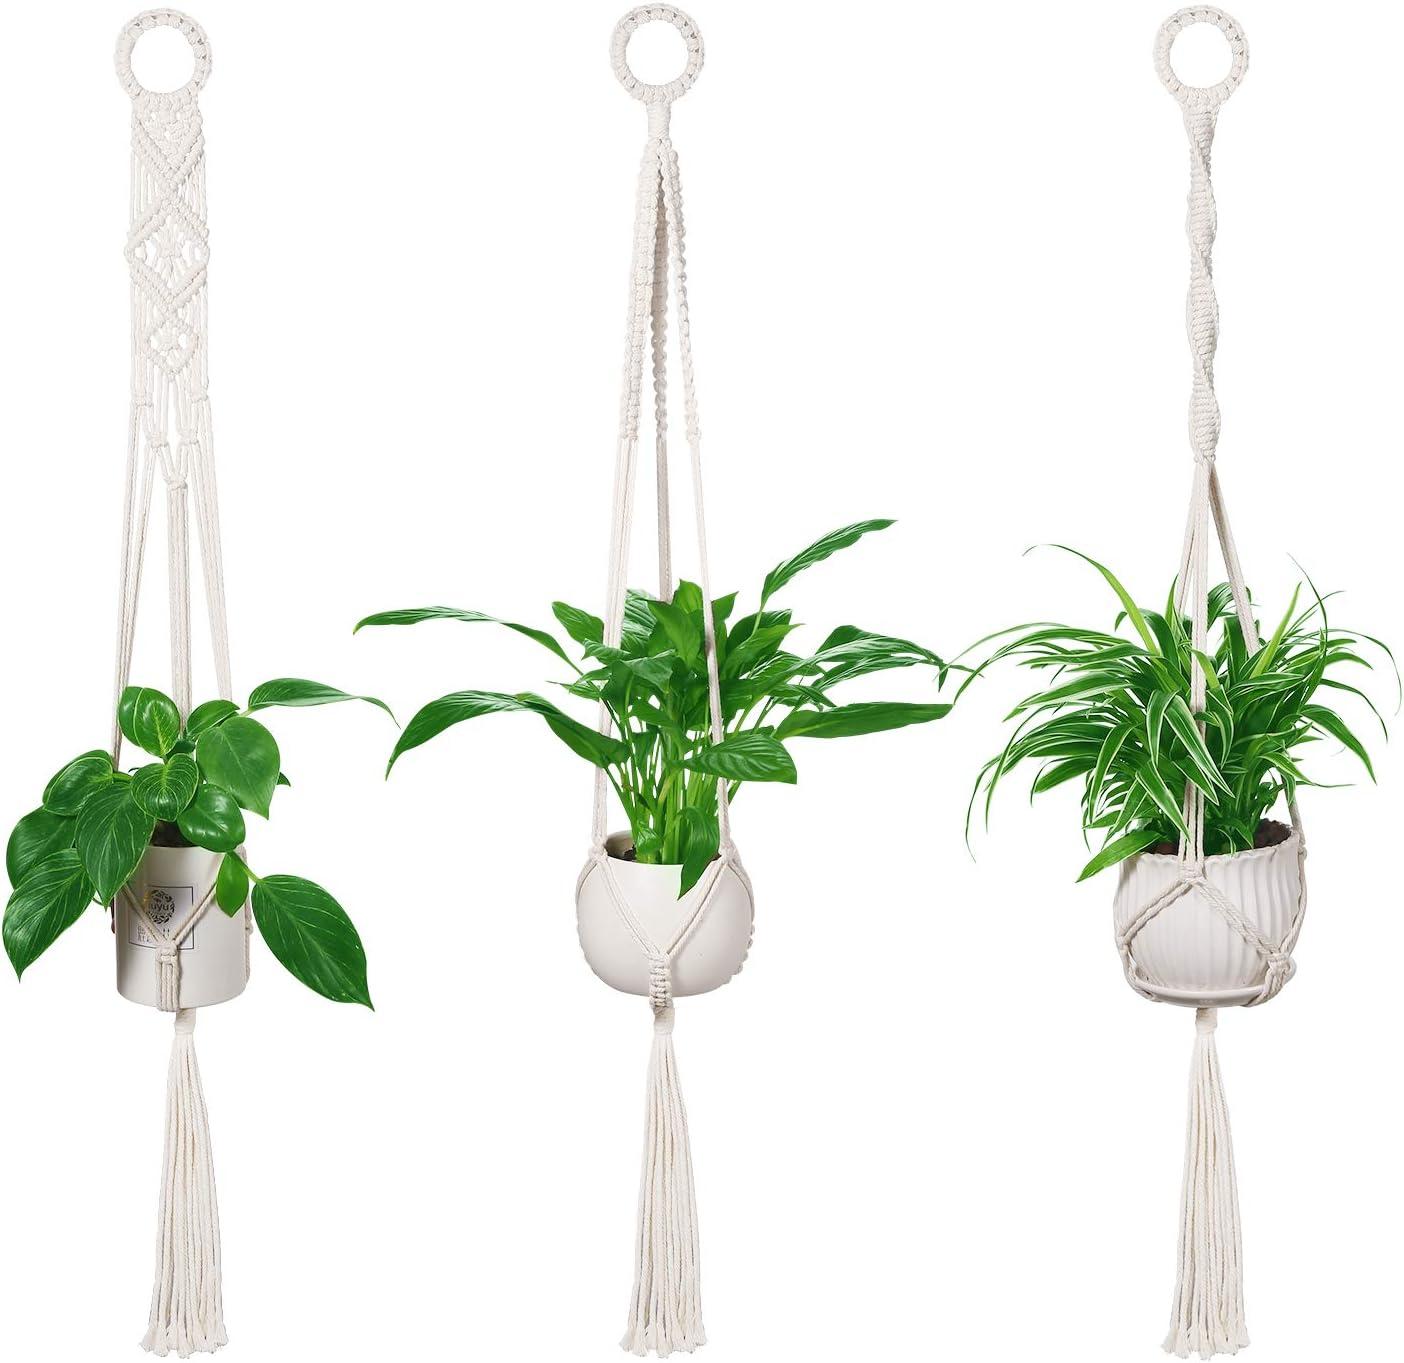 LEEPES 3 Pack Macrame Plant Hangers Indoor Wall Hanging Planters, Handmade Hanging Plant Holder Basket Stand Flower Pot Holder for Indoor Outdoor Boho Home Decor(4 Legs, 39 Inch)